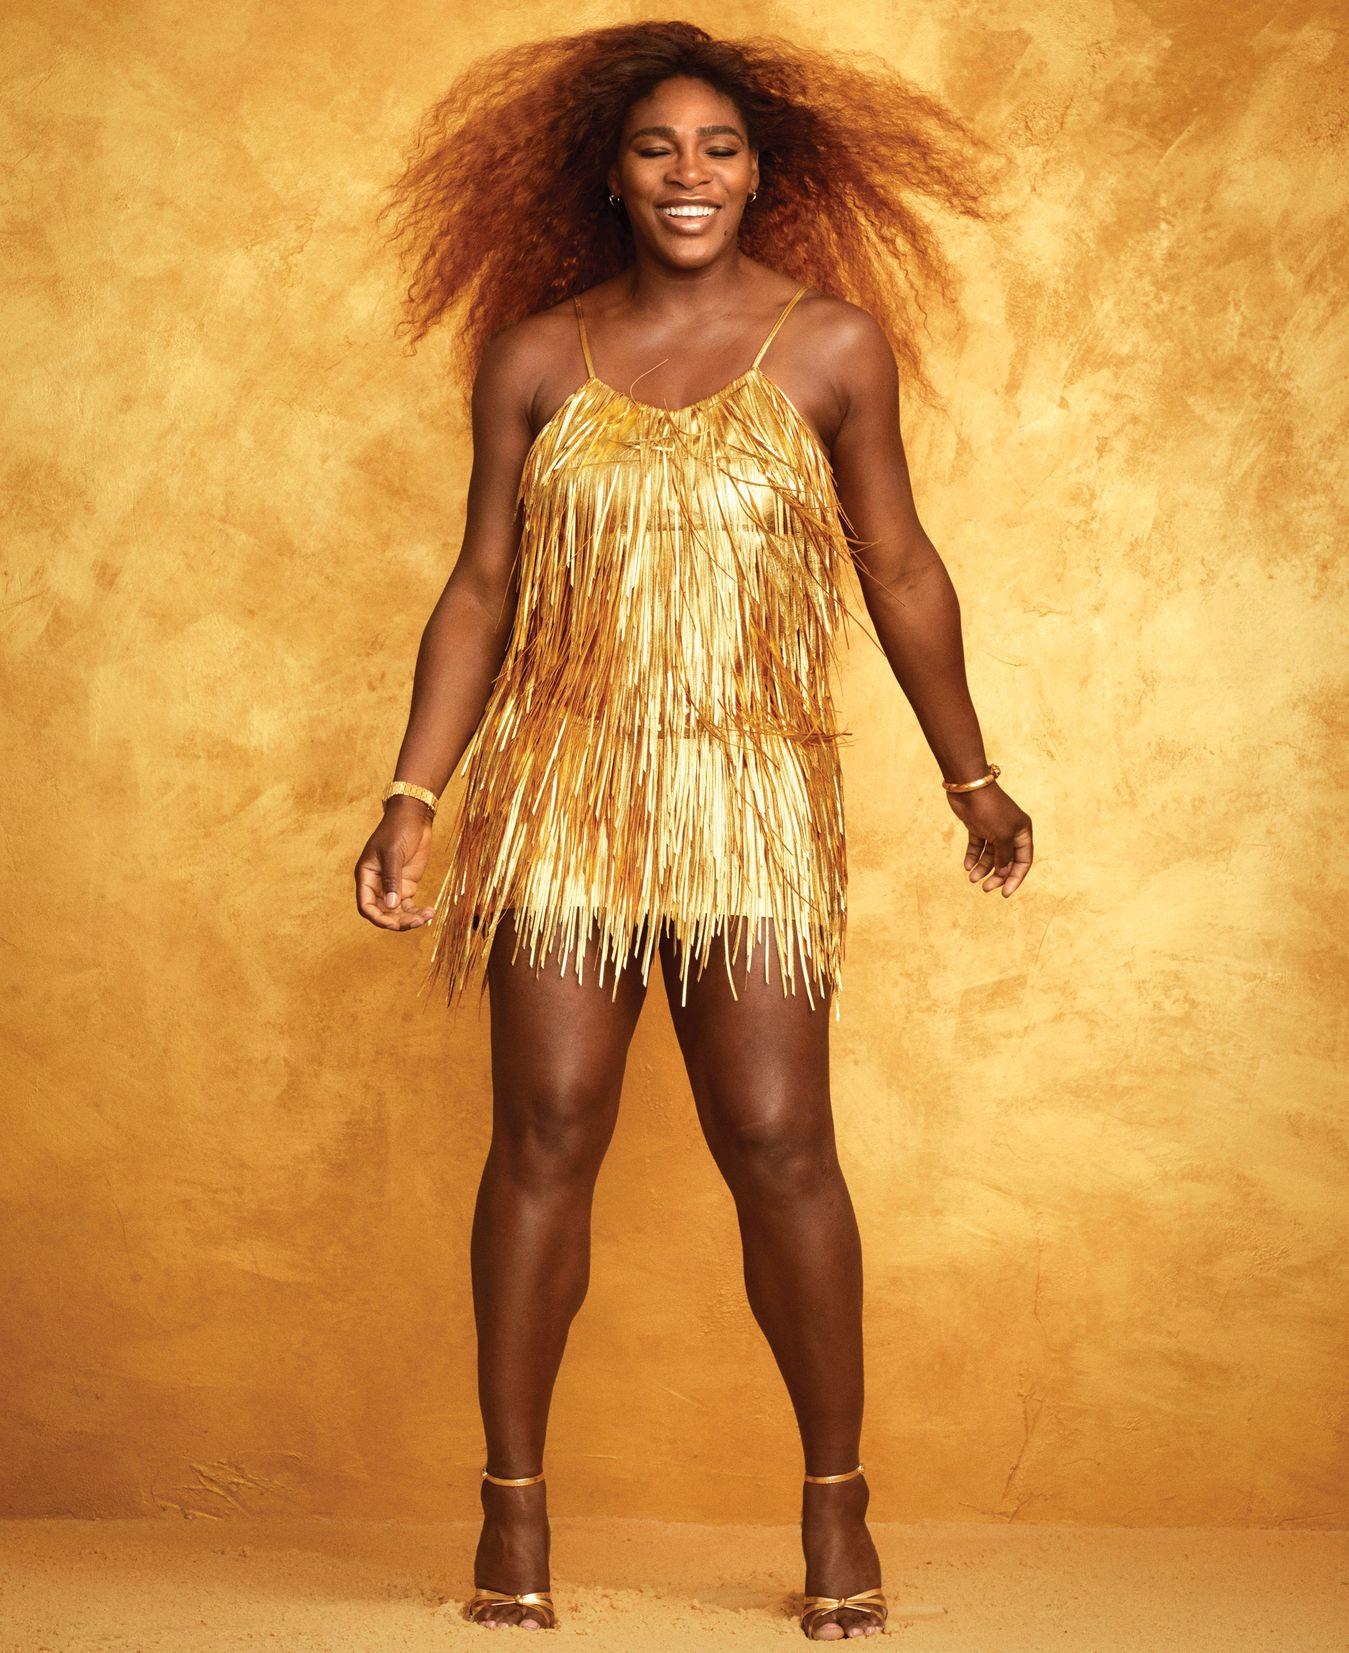 Serena Williams by Alexi Lubomirski for British Vogue Aug 2019 (4).jpg